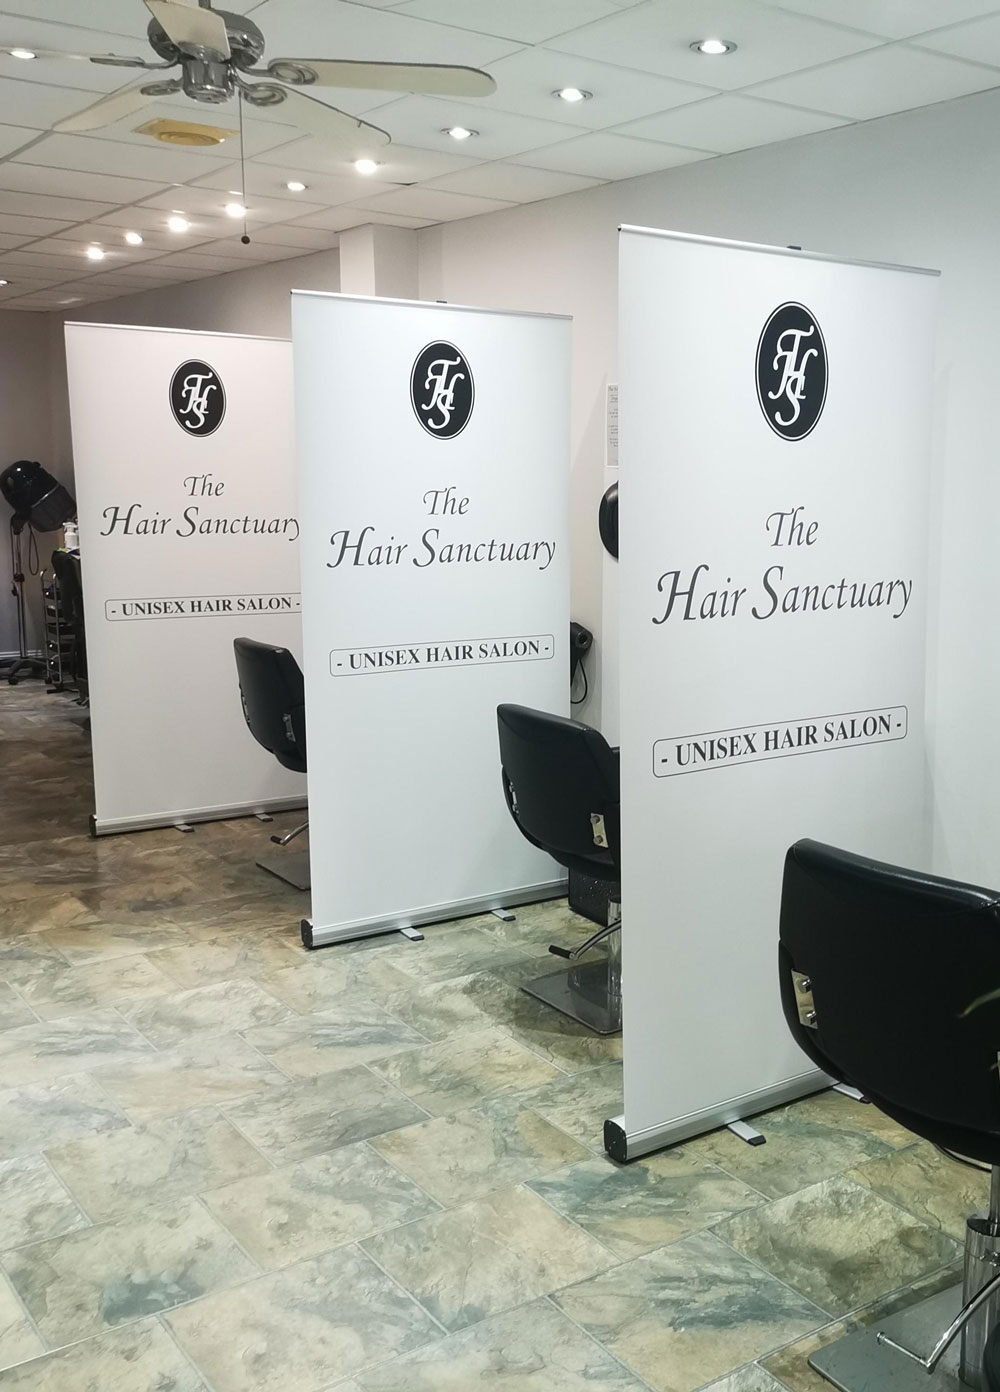 hair-sanctuary-roller-banner-dividers